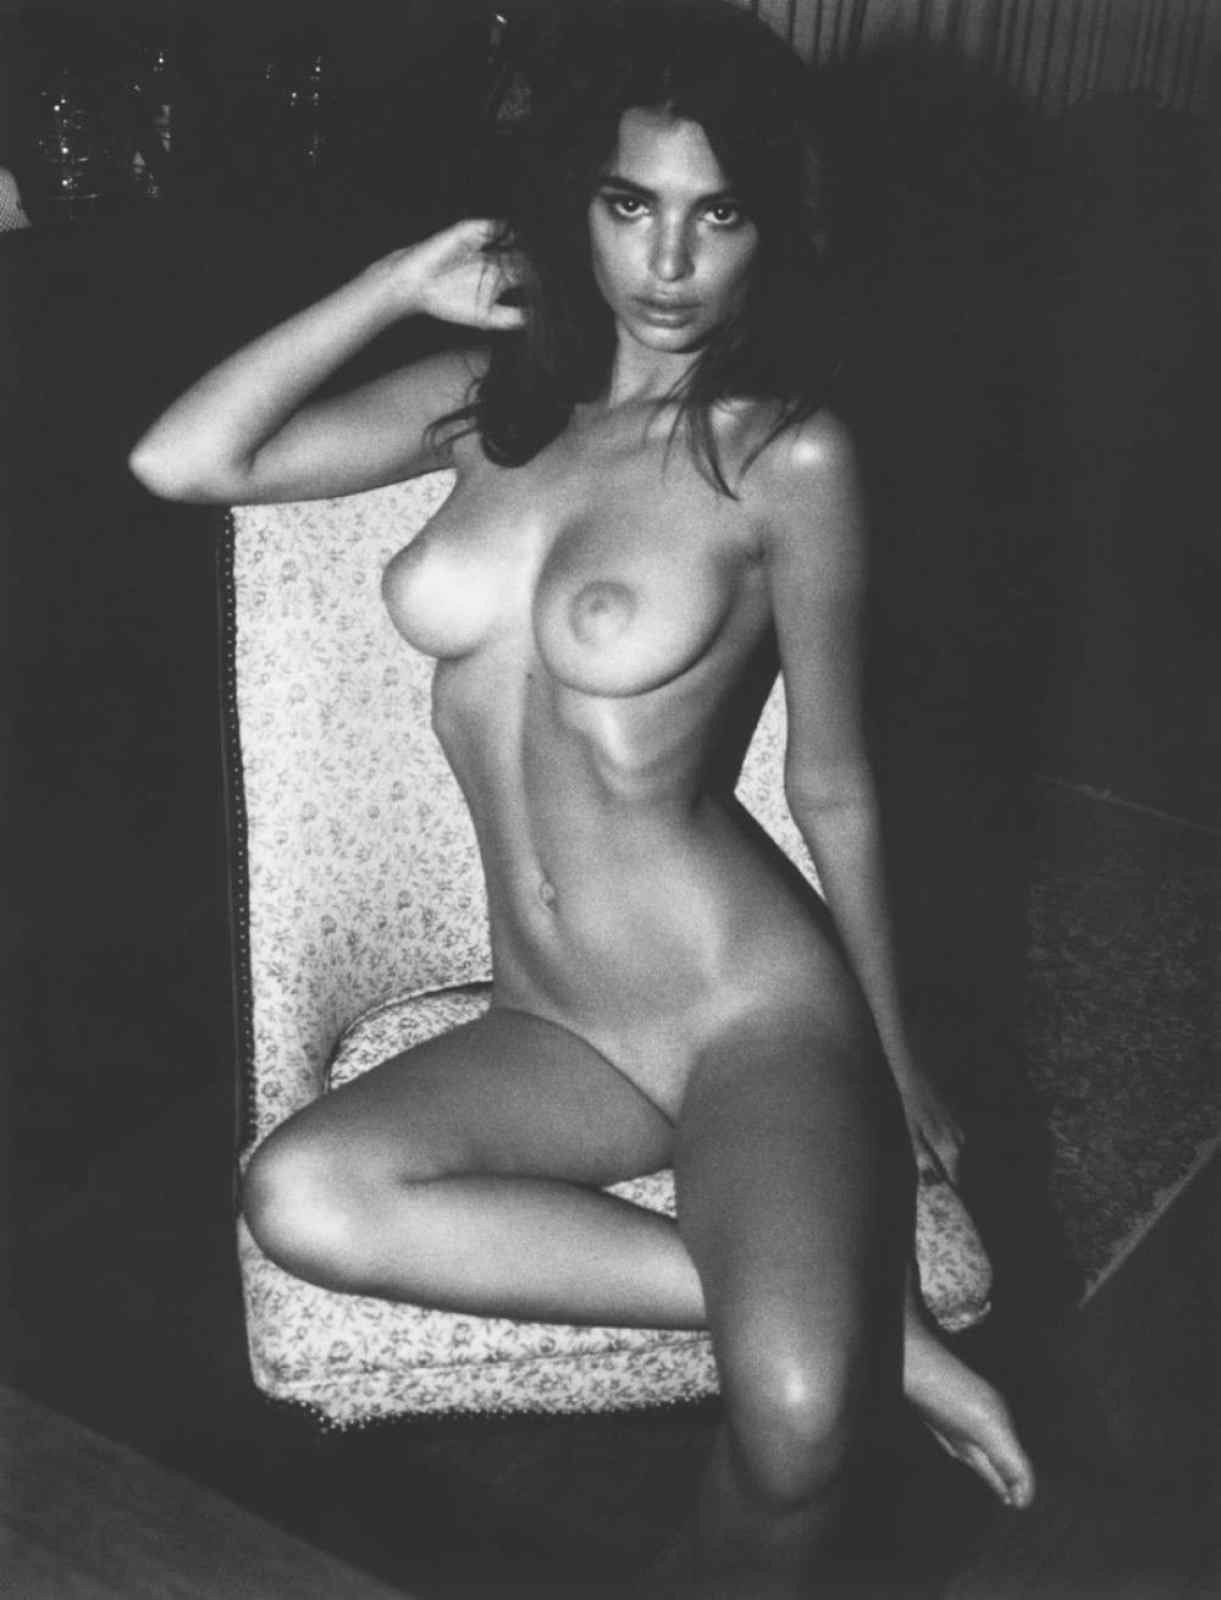 Ampliar Desnudos de Emily Ratajkowski - NENAS VIPS - PUTAS KINESIOLOGAS